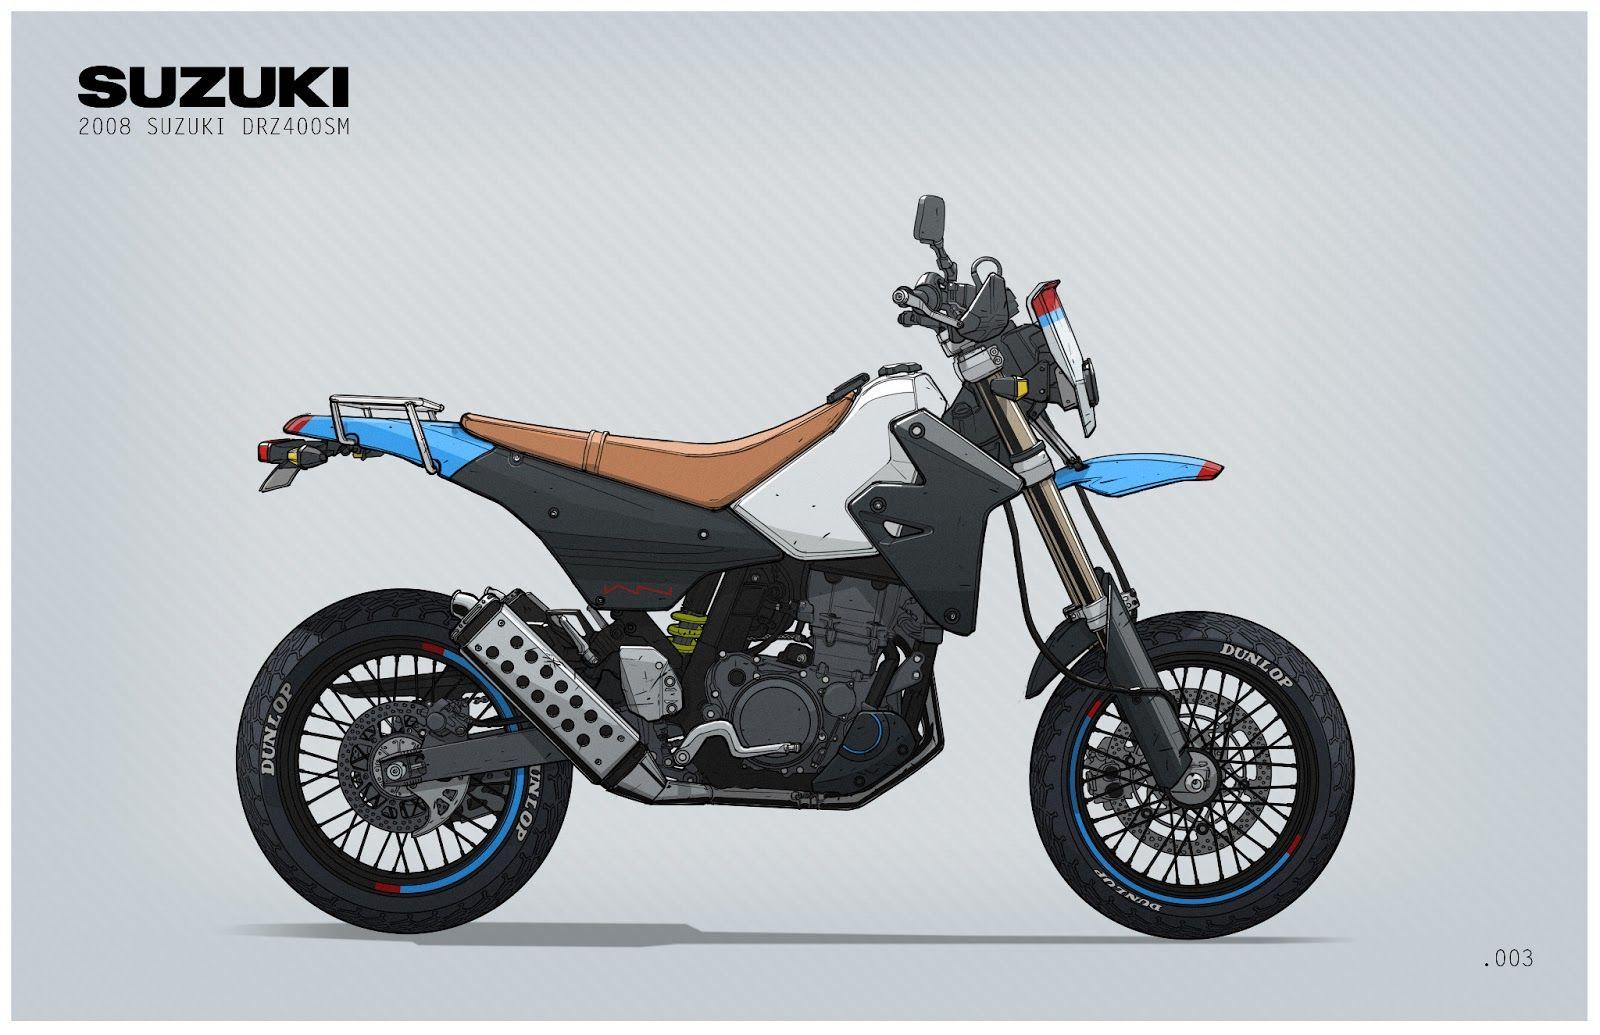 Suzuki DRZ400SM by Ian Galvin   Motorcycles & Cars   Pinterest ...